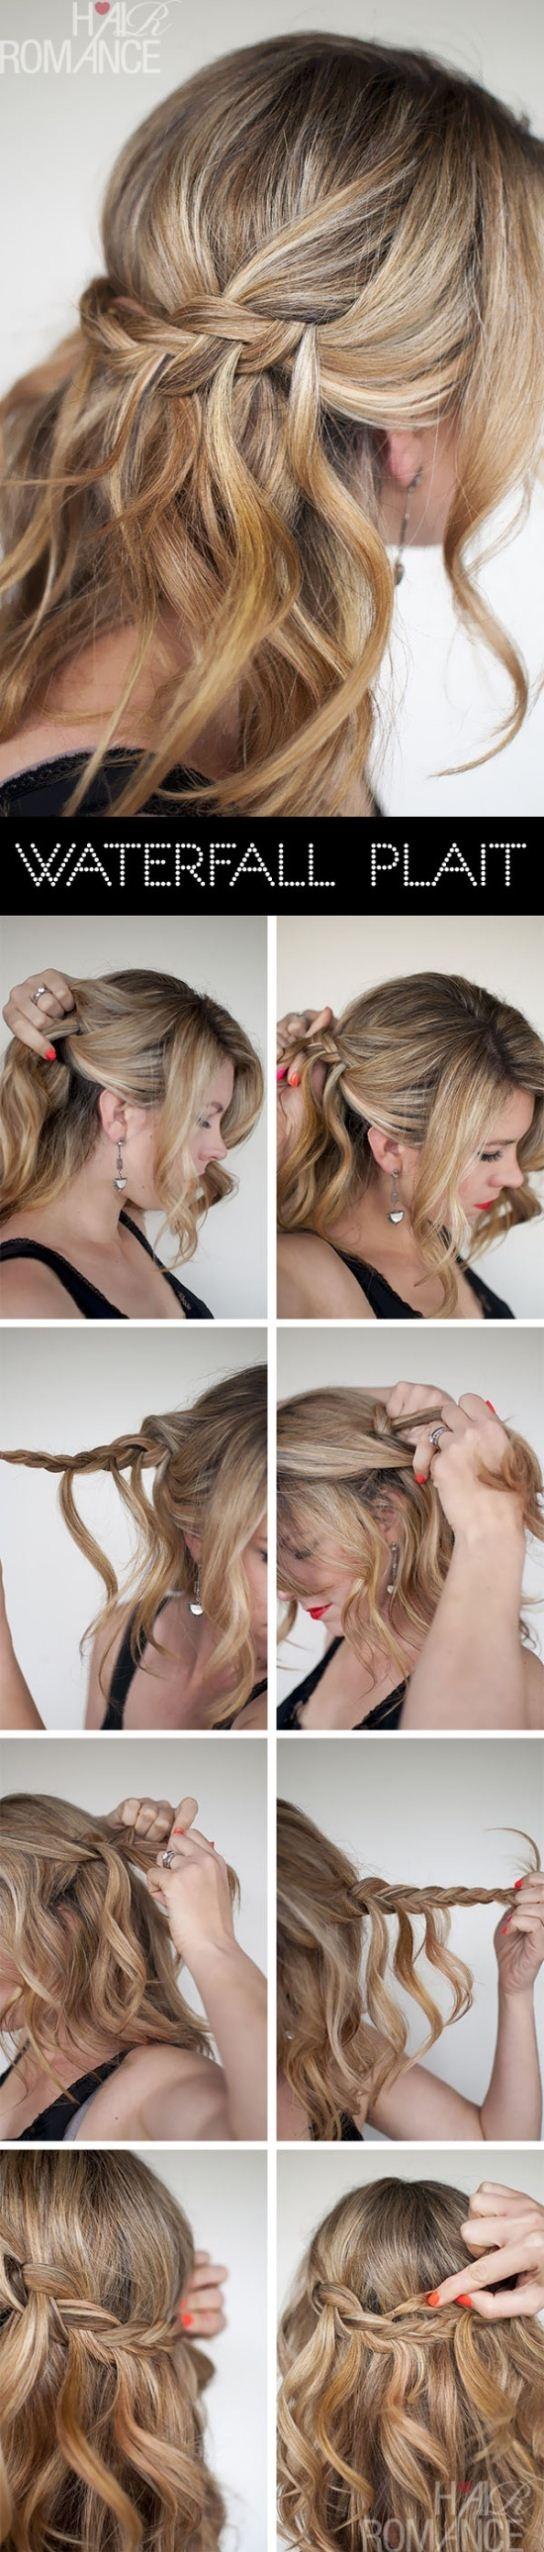 DIY Waterfall Plait Hairstyle via